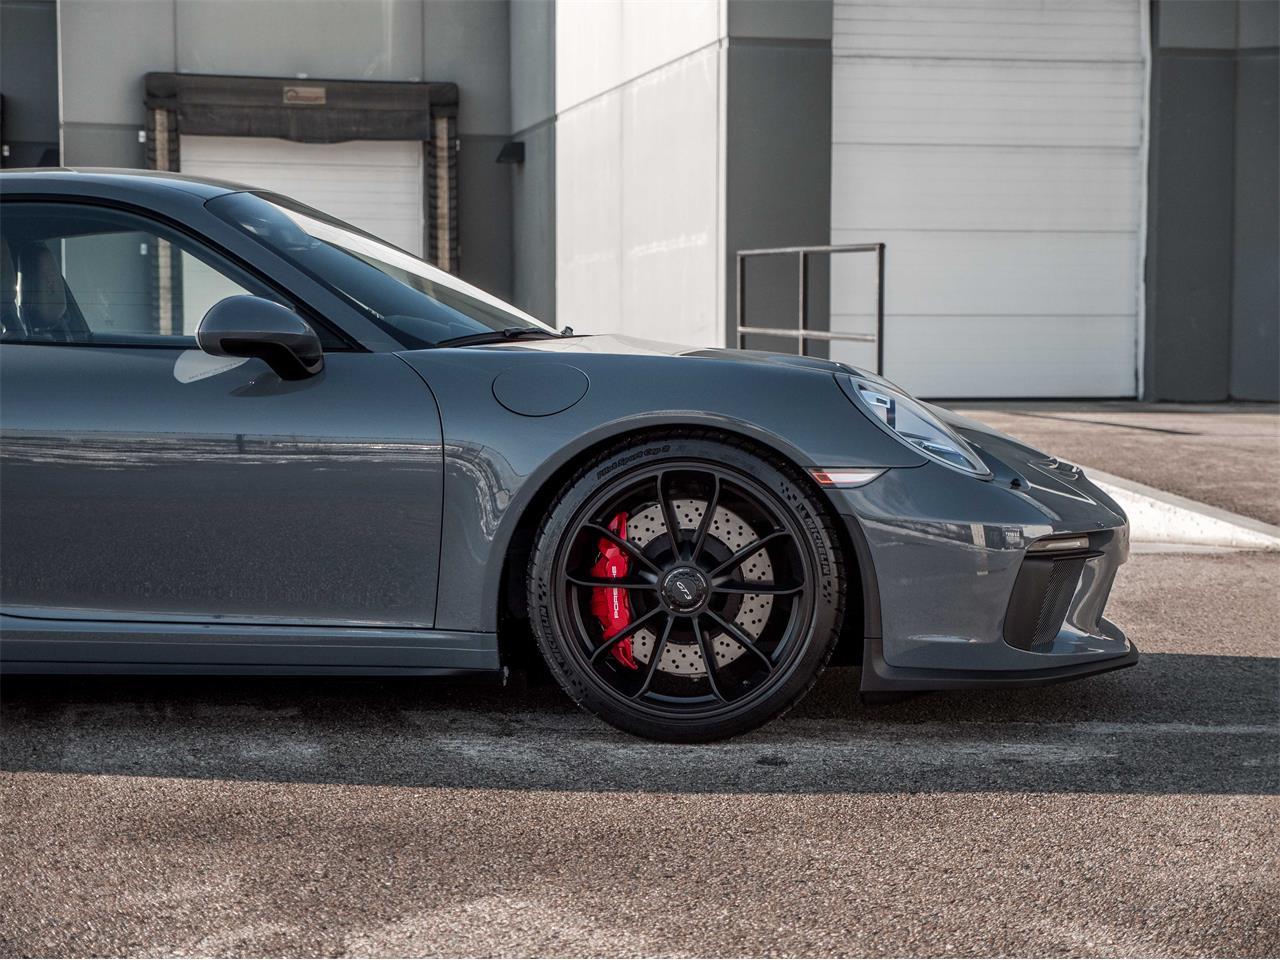 2018 Porsche 911 (CC-1322133) for sale in Kelowna, British Columbia